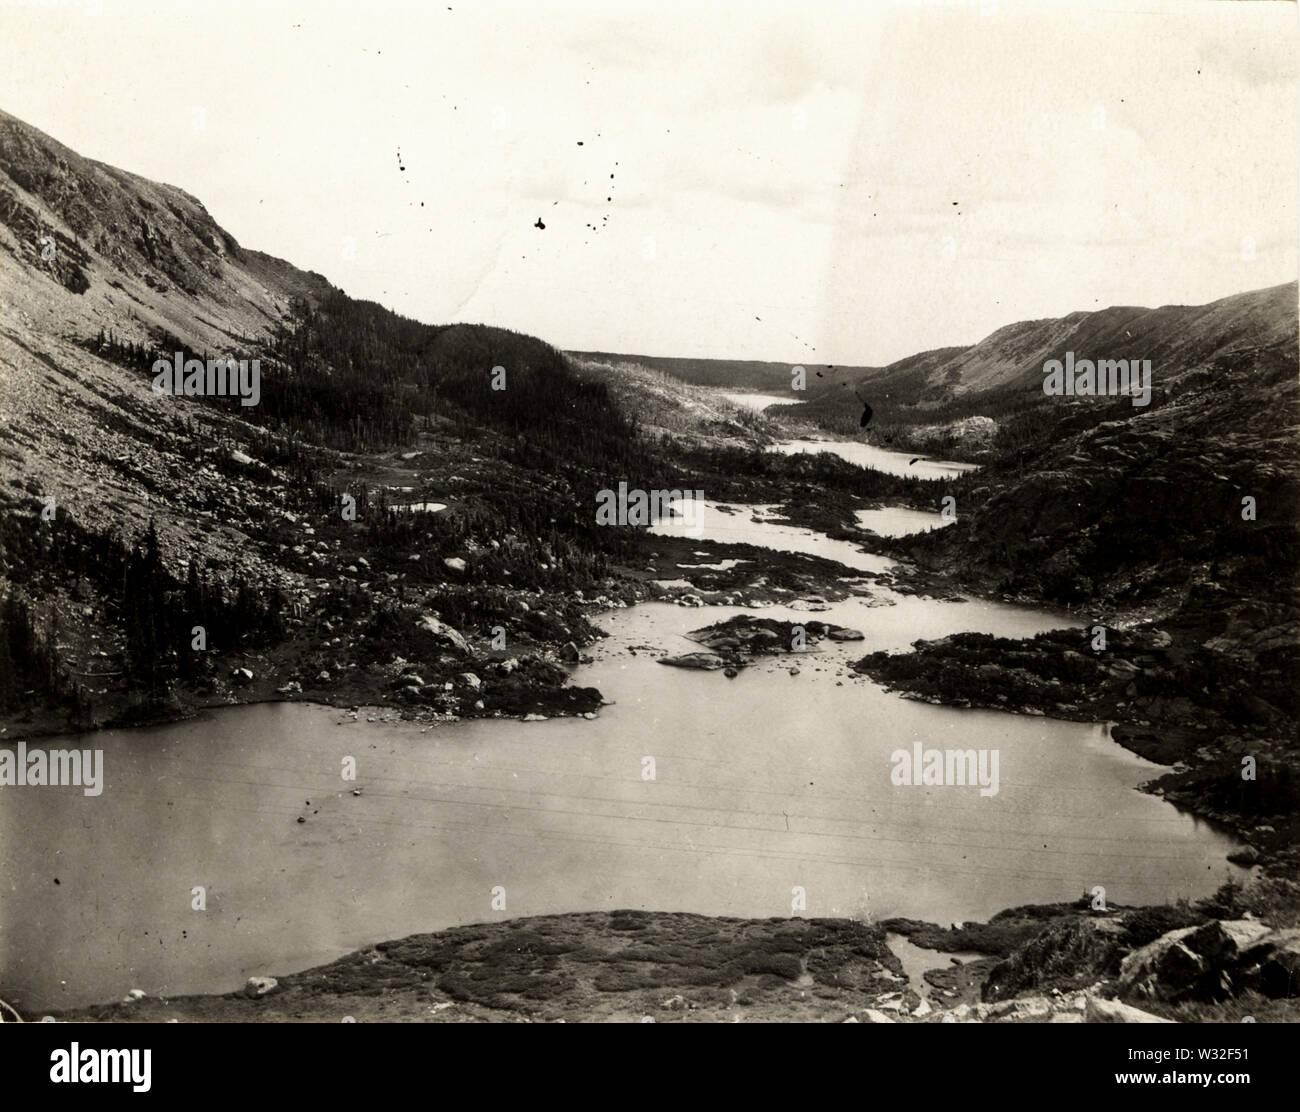 Notes: Photo ID: arapaho henderson 001 Glacier Name: Arapaho Glacier